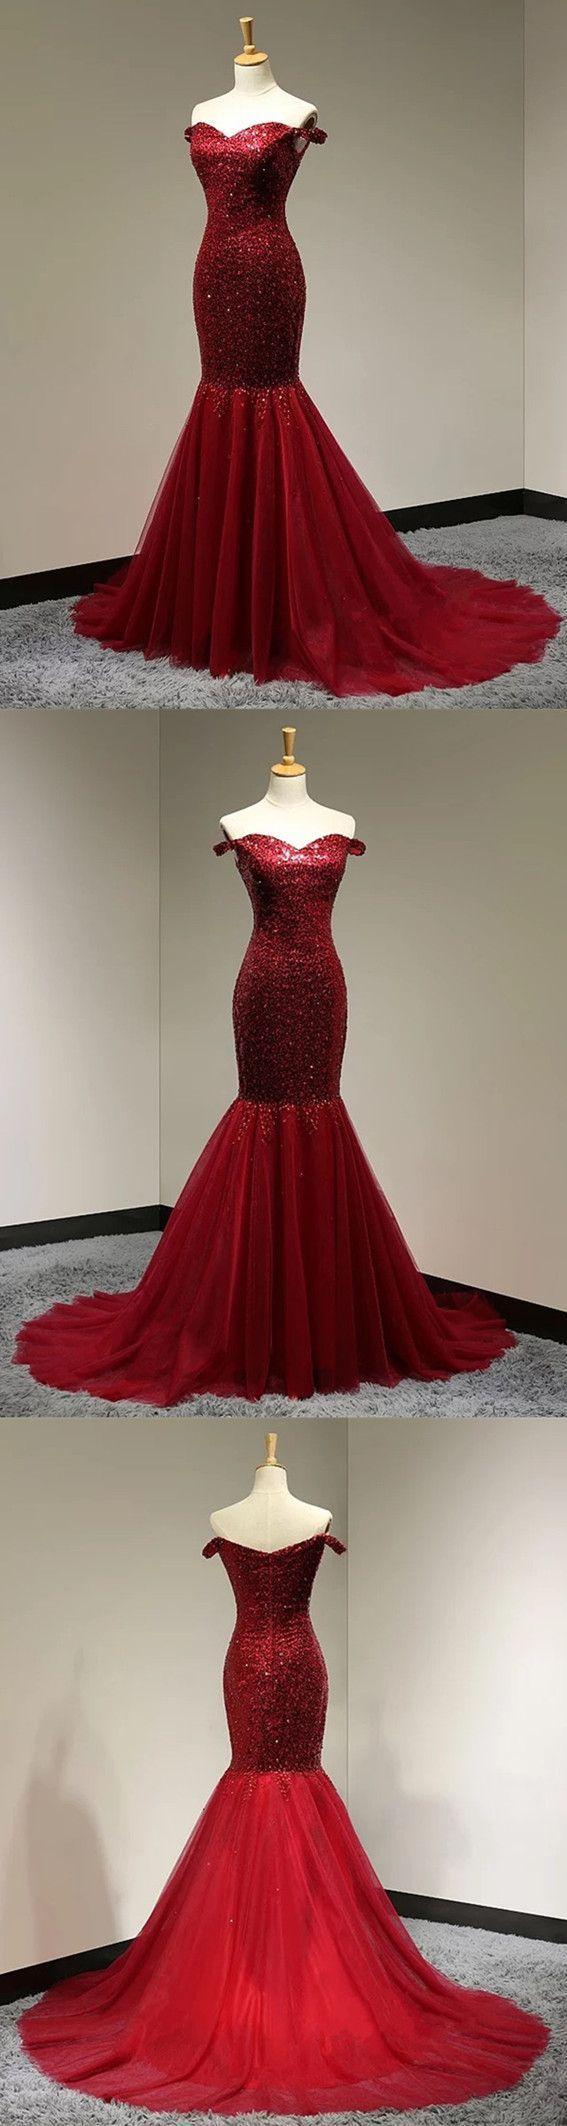 Burgundy Sequins Sweetheart Mermaid Evening Dress Off Shoulder Prom Gowns 2018 #longpromdresses #eveningdresses